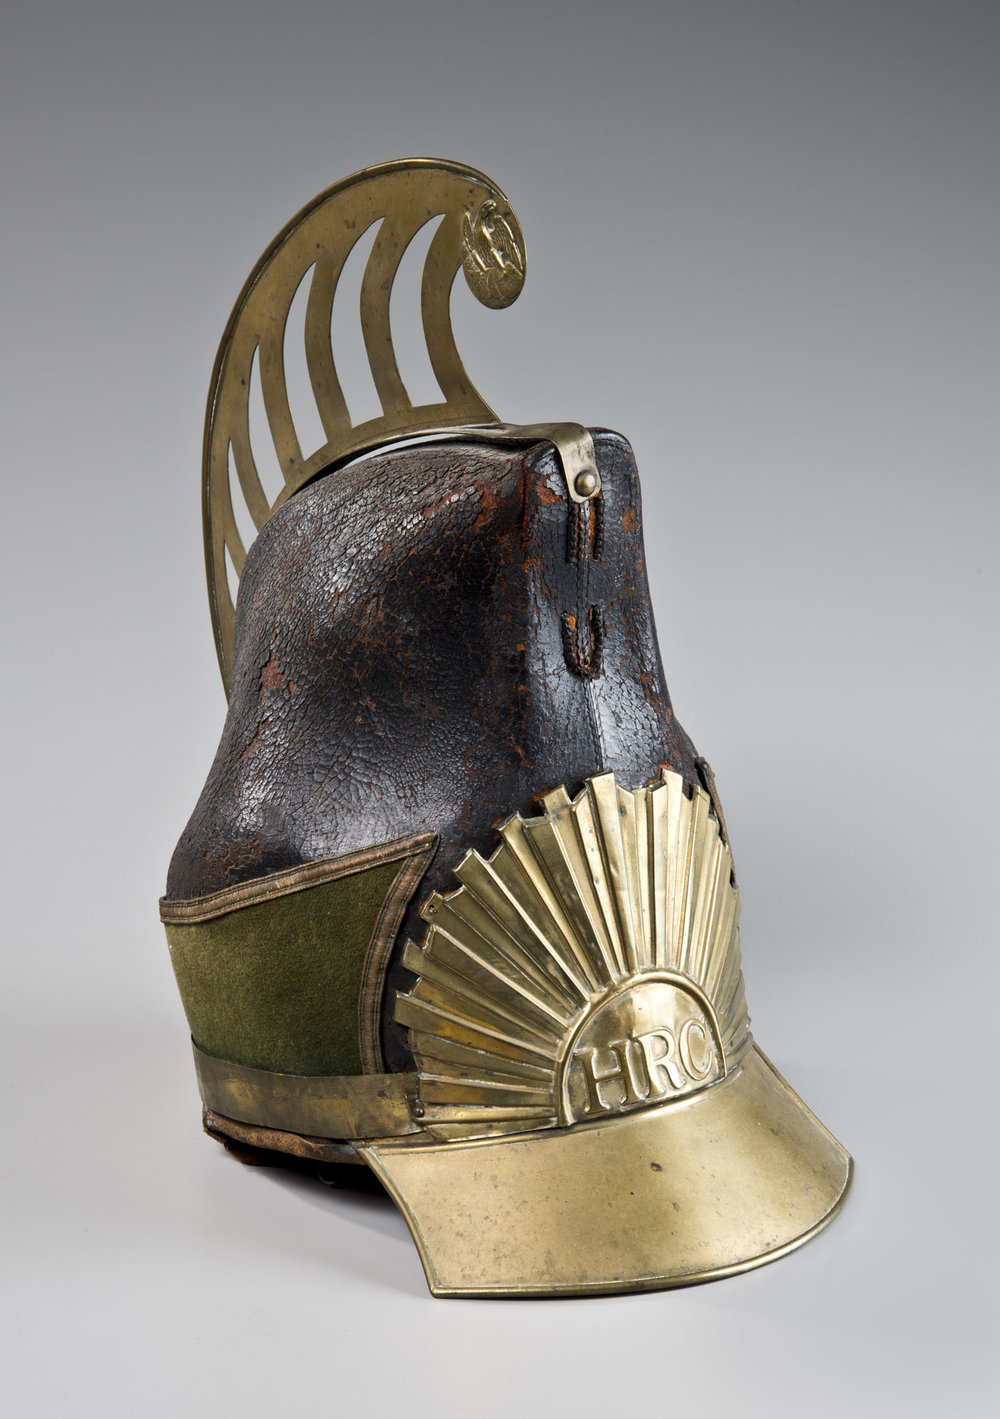 Militia Helmet, Hingham Rifle Company, MA, ca. 1840